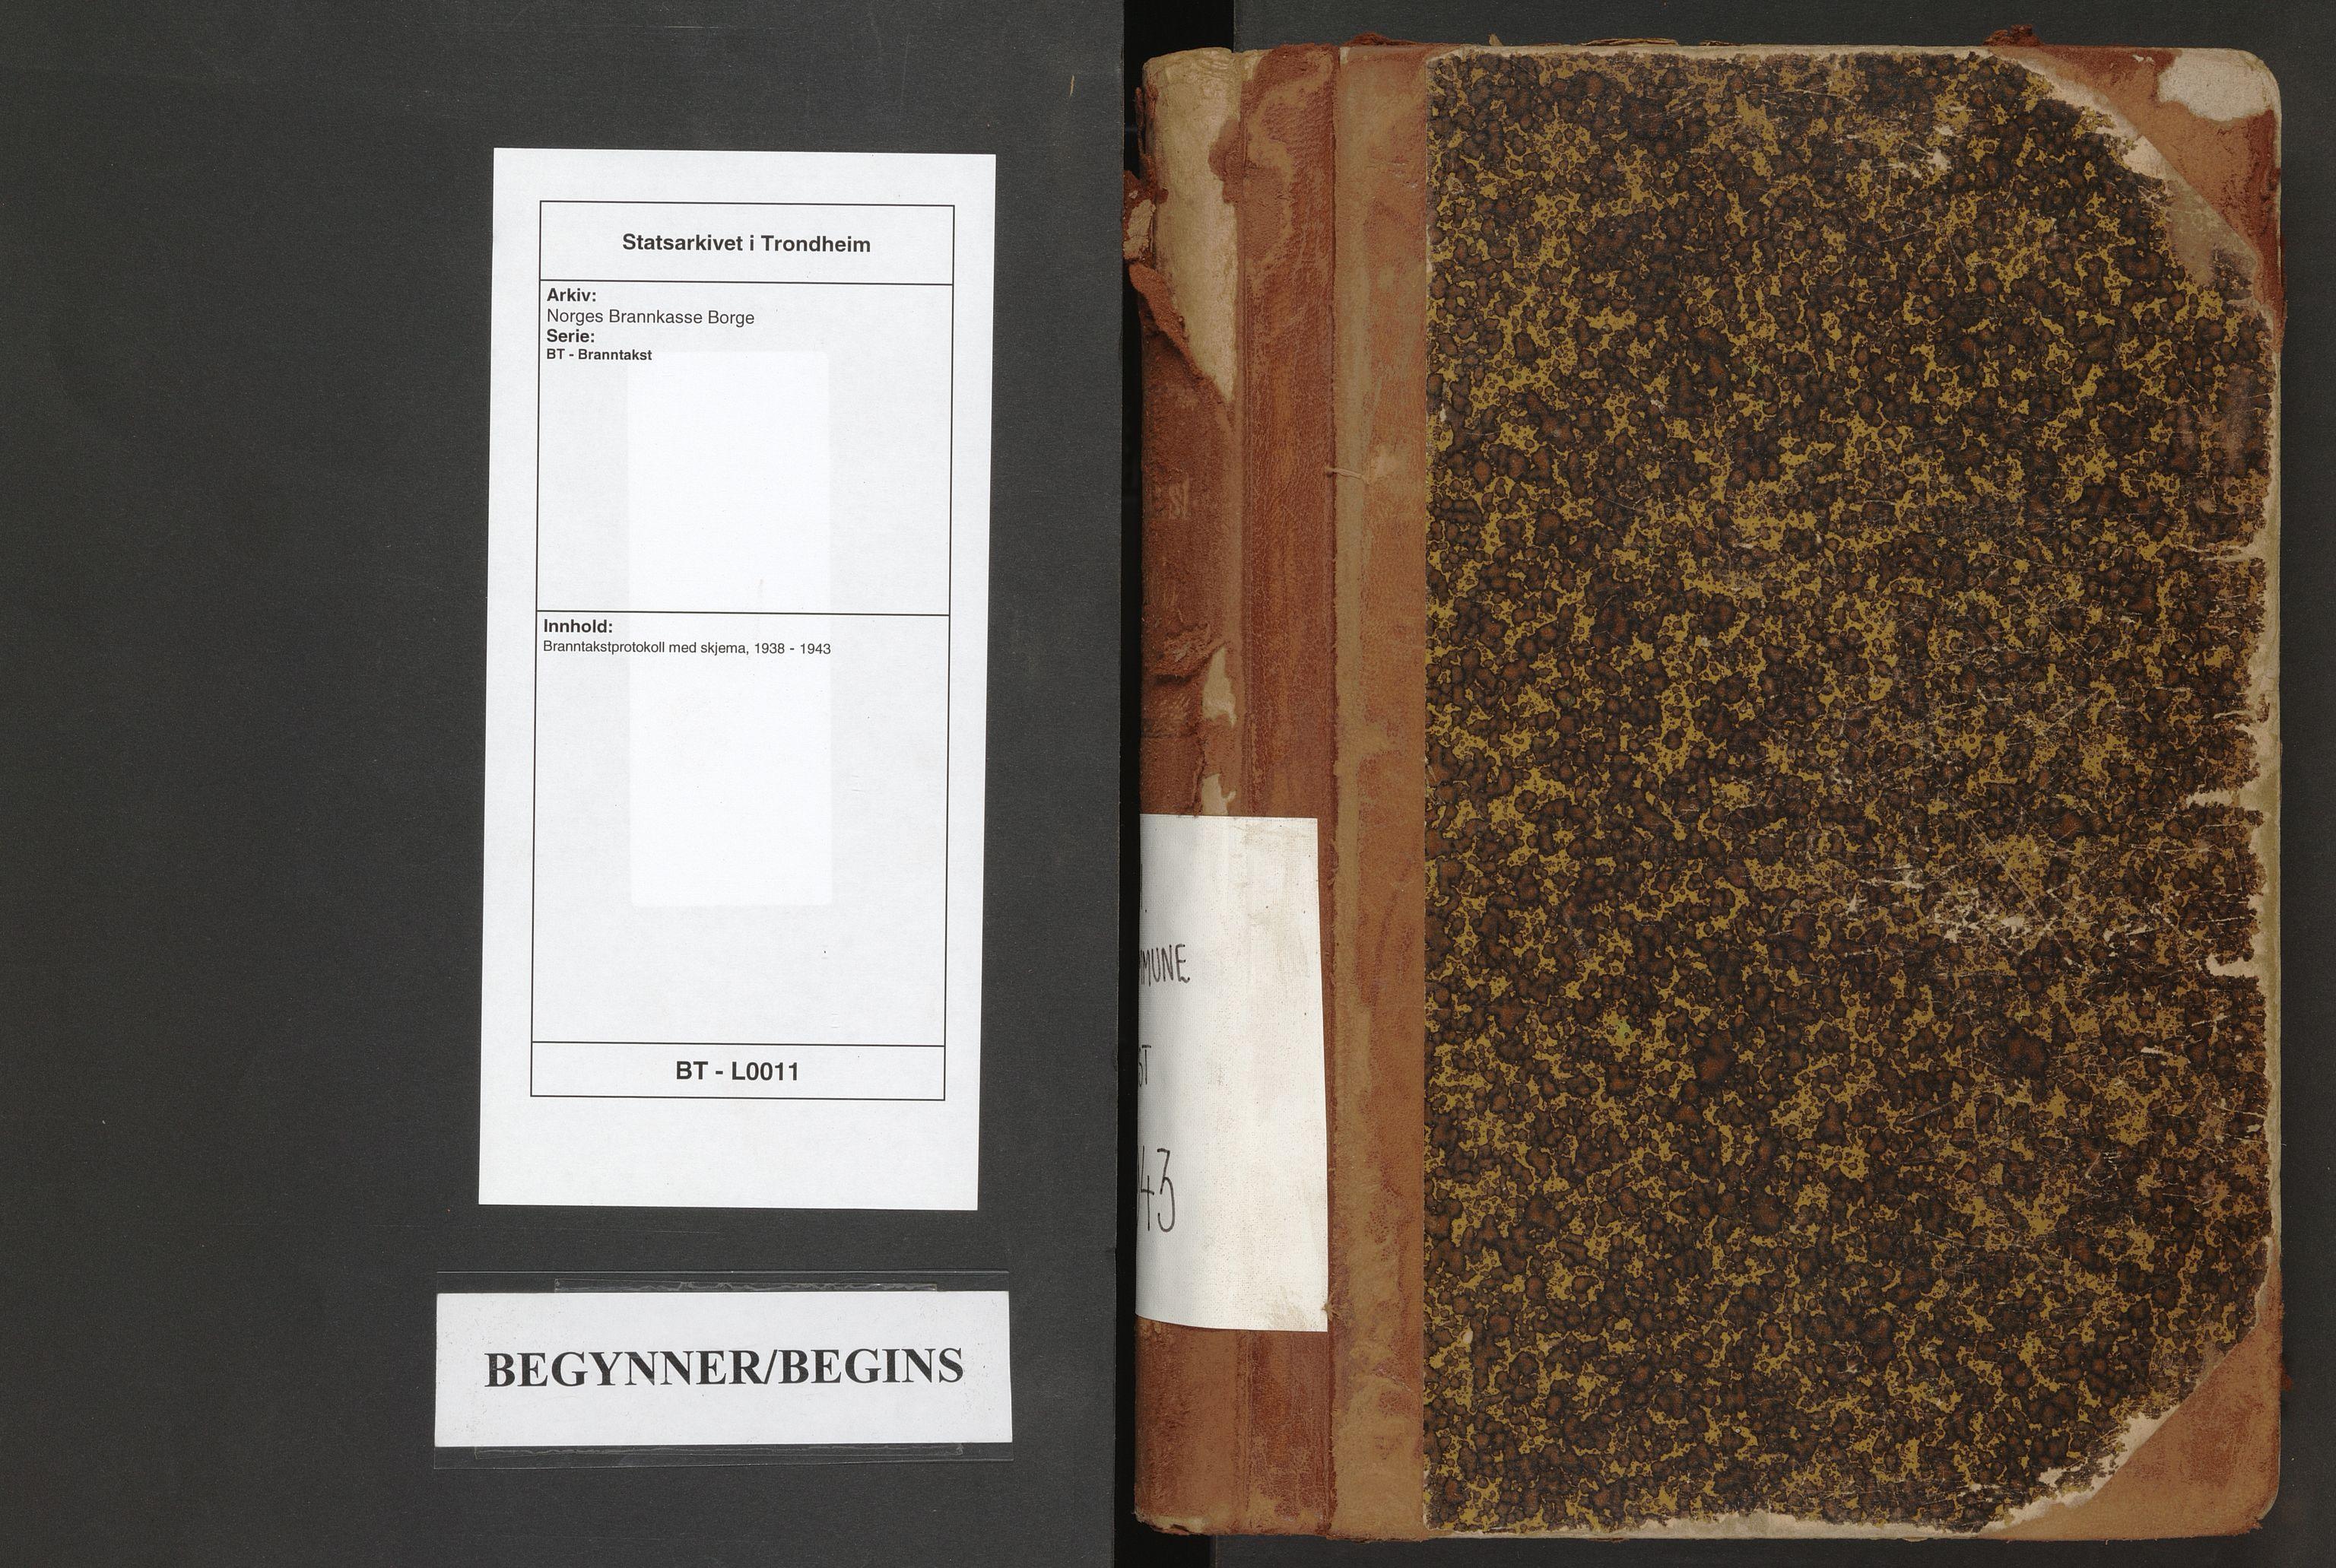 SAT, Norges Brannkasse Borge, BT/L0011: Branntakstprotokoll med skjema, 1938-1943